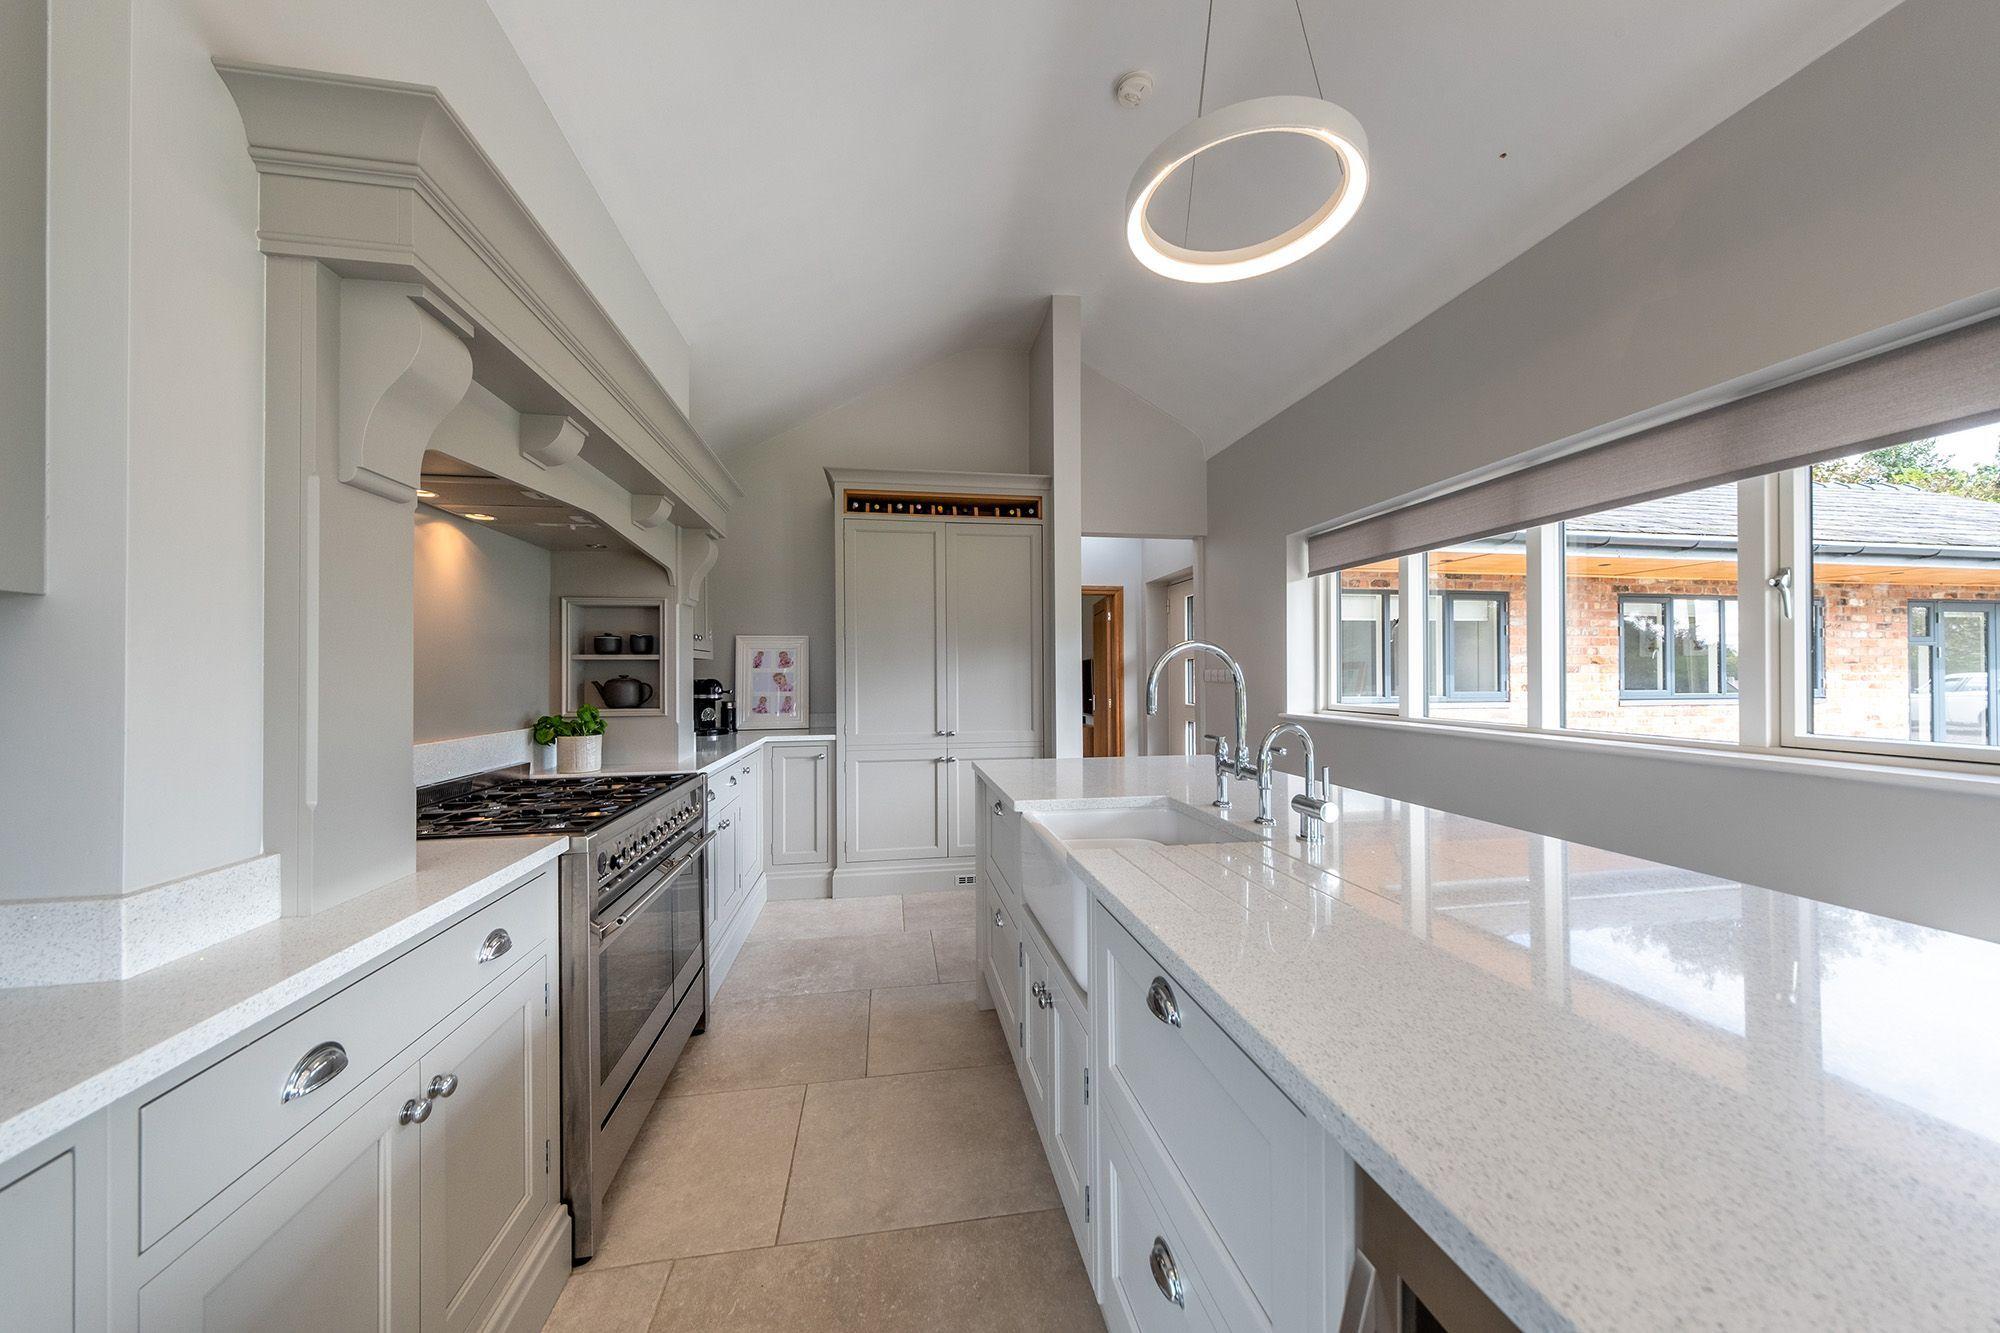 Modern kitchen with vaulted ceiling large island and range cooker #vaultedceilingdecor Modern kitchen with vaulted ceiling large island and range cooker #vaultedceilingdecor